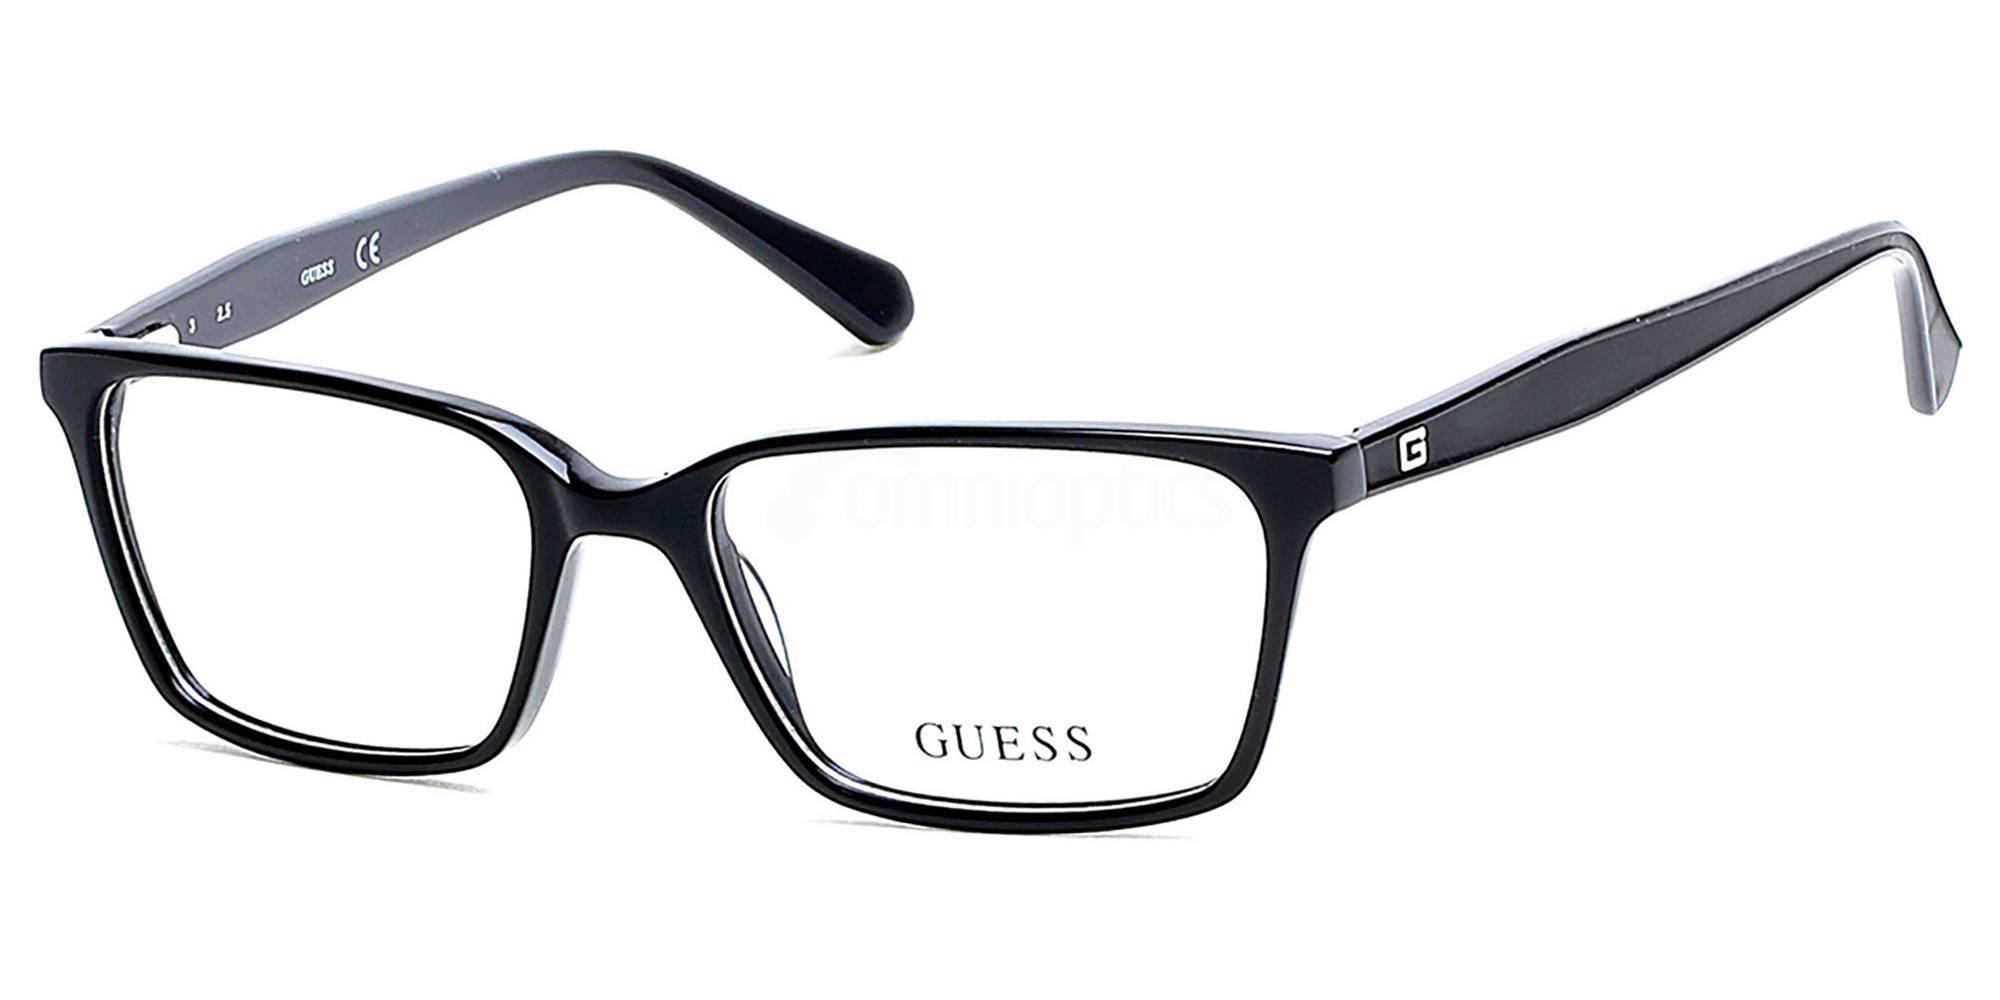 001 GU1898 , Guess